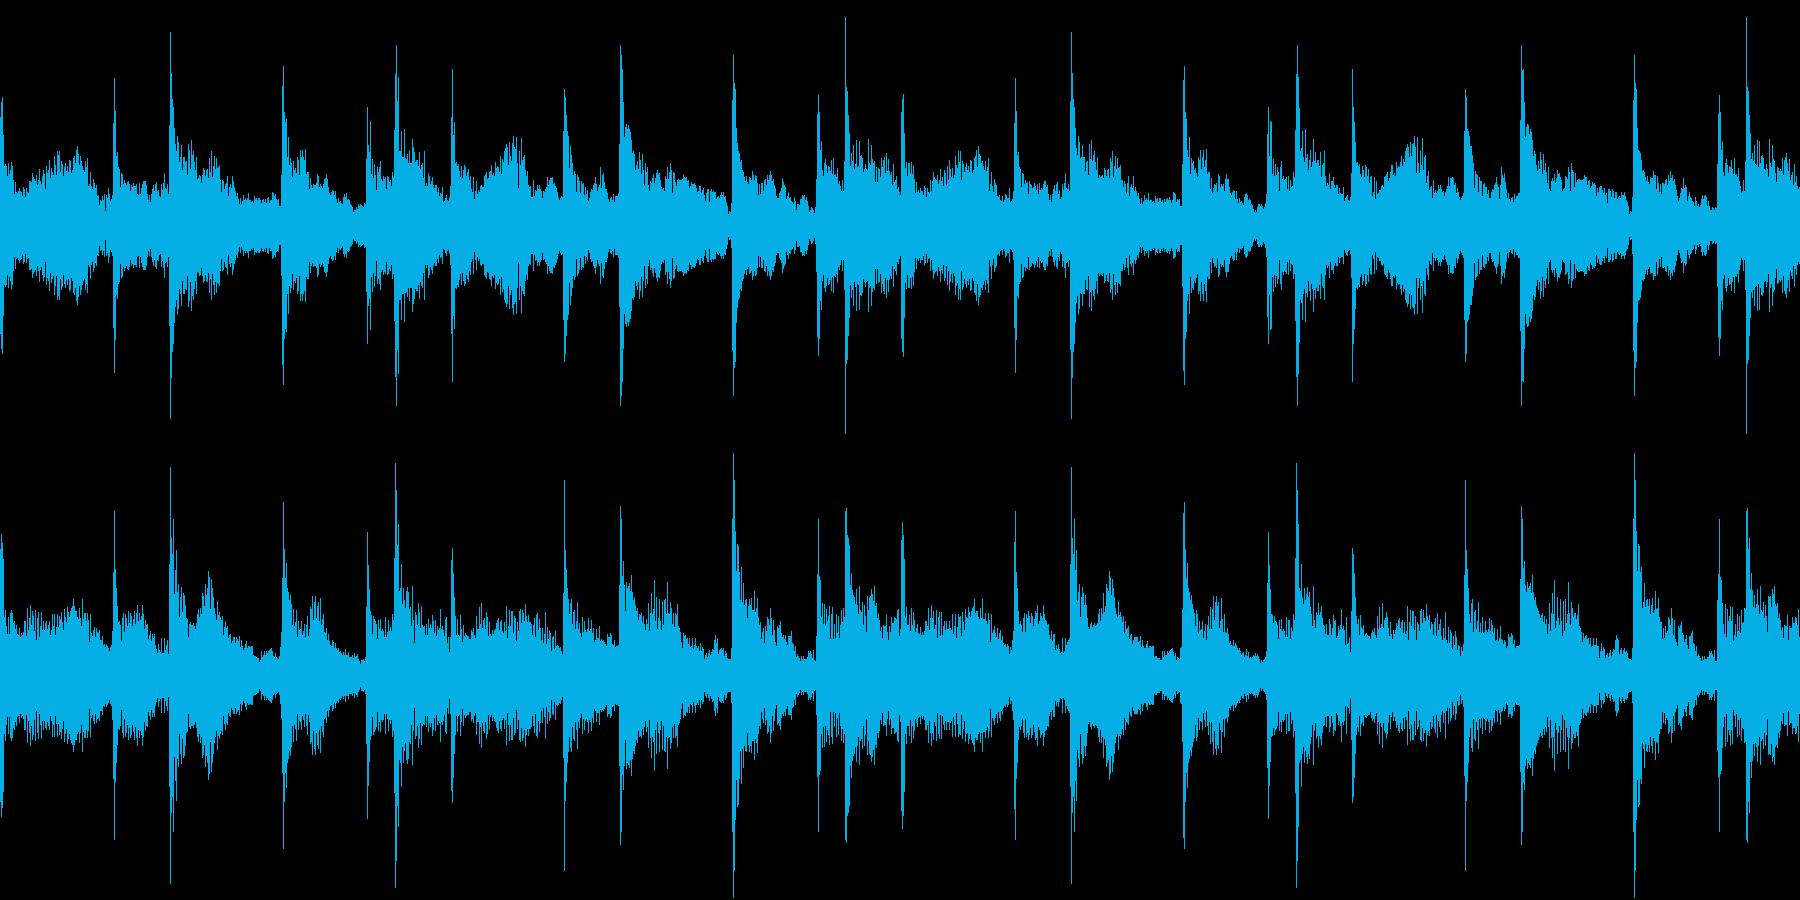 House コードシンセ 4 音楽制作用の再生済みの波形